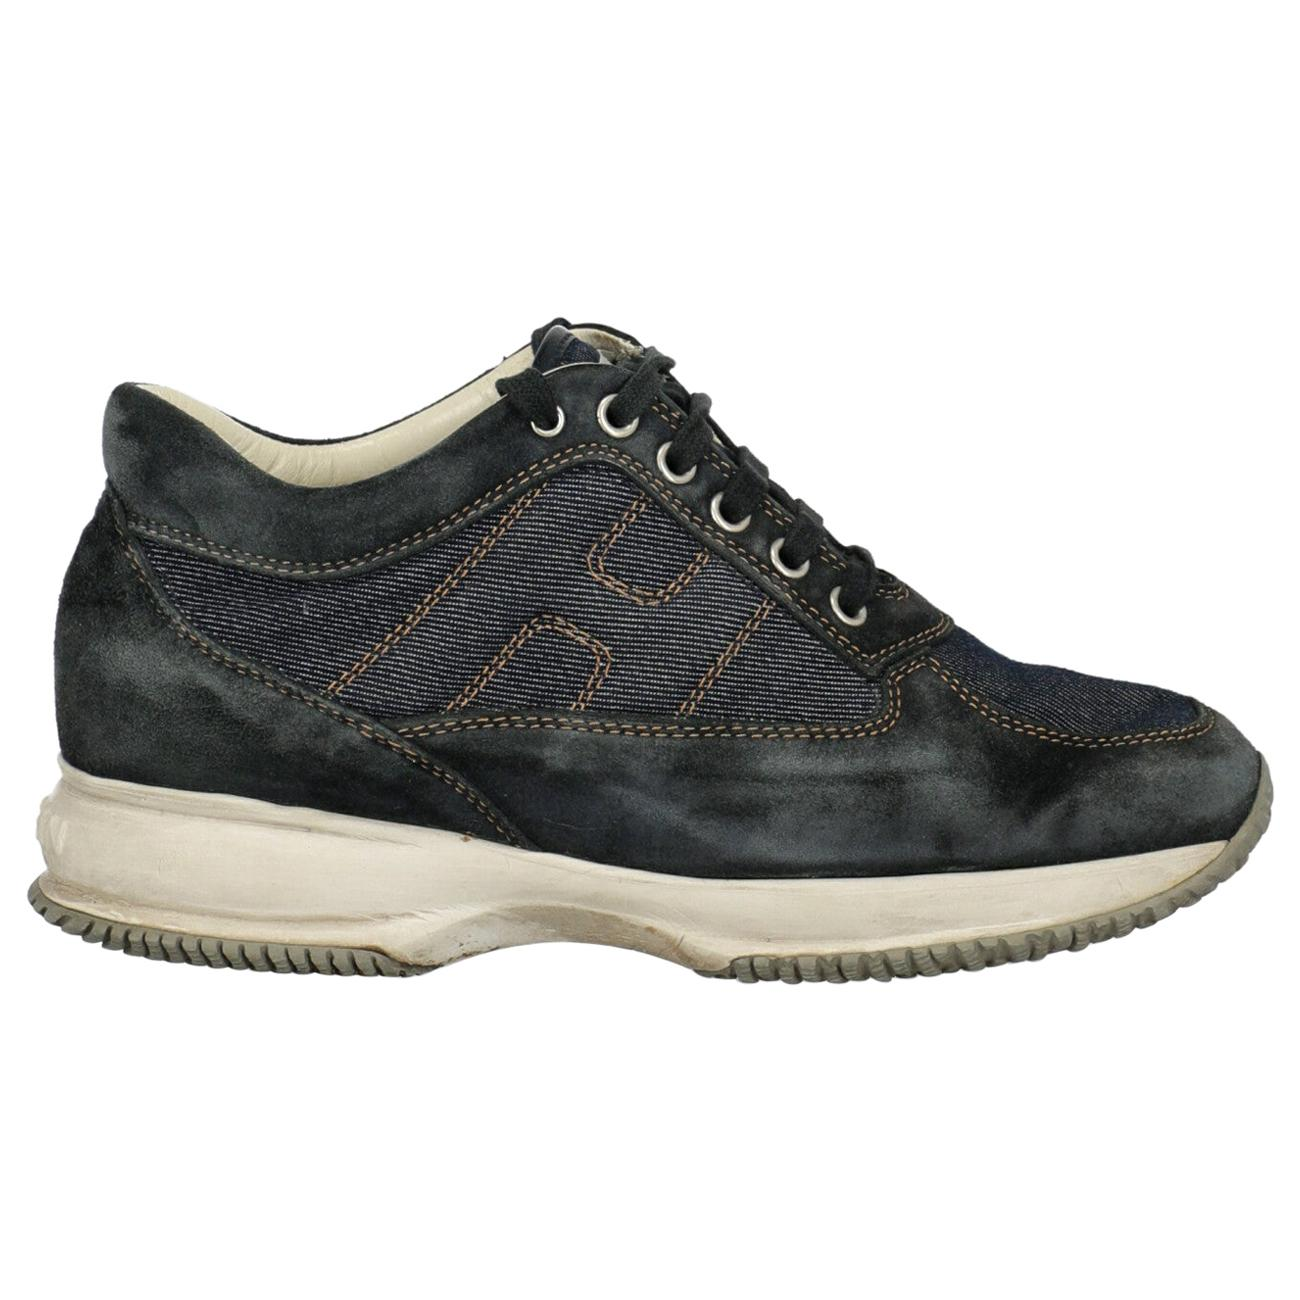 Hogan Woman Sneakers Navy Leather IT 36